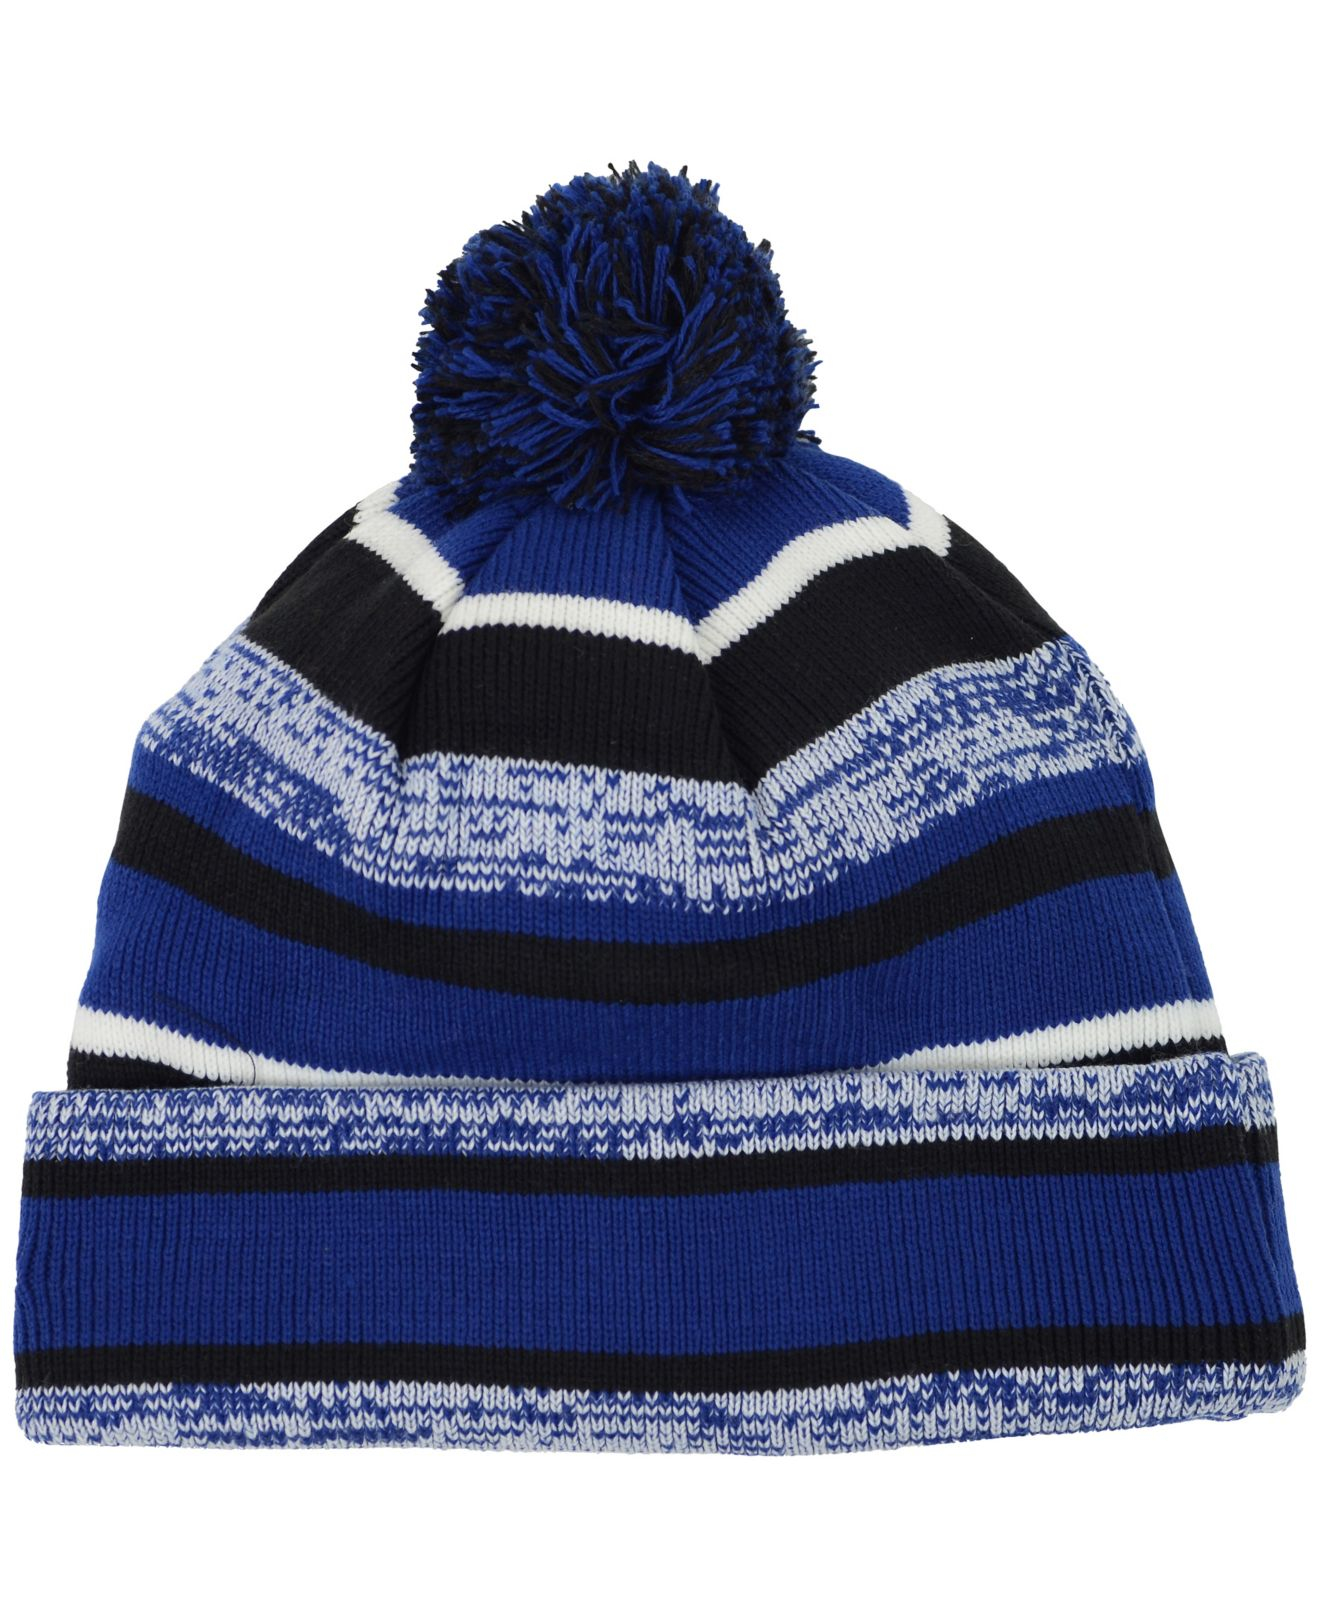 Lyst - KTZ Seton Hall Pirates Sport Knit Hat in Blue for Men 314036d9e094